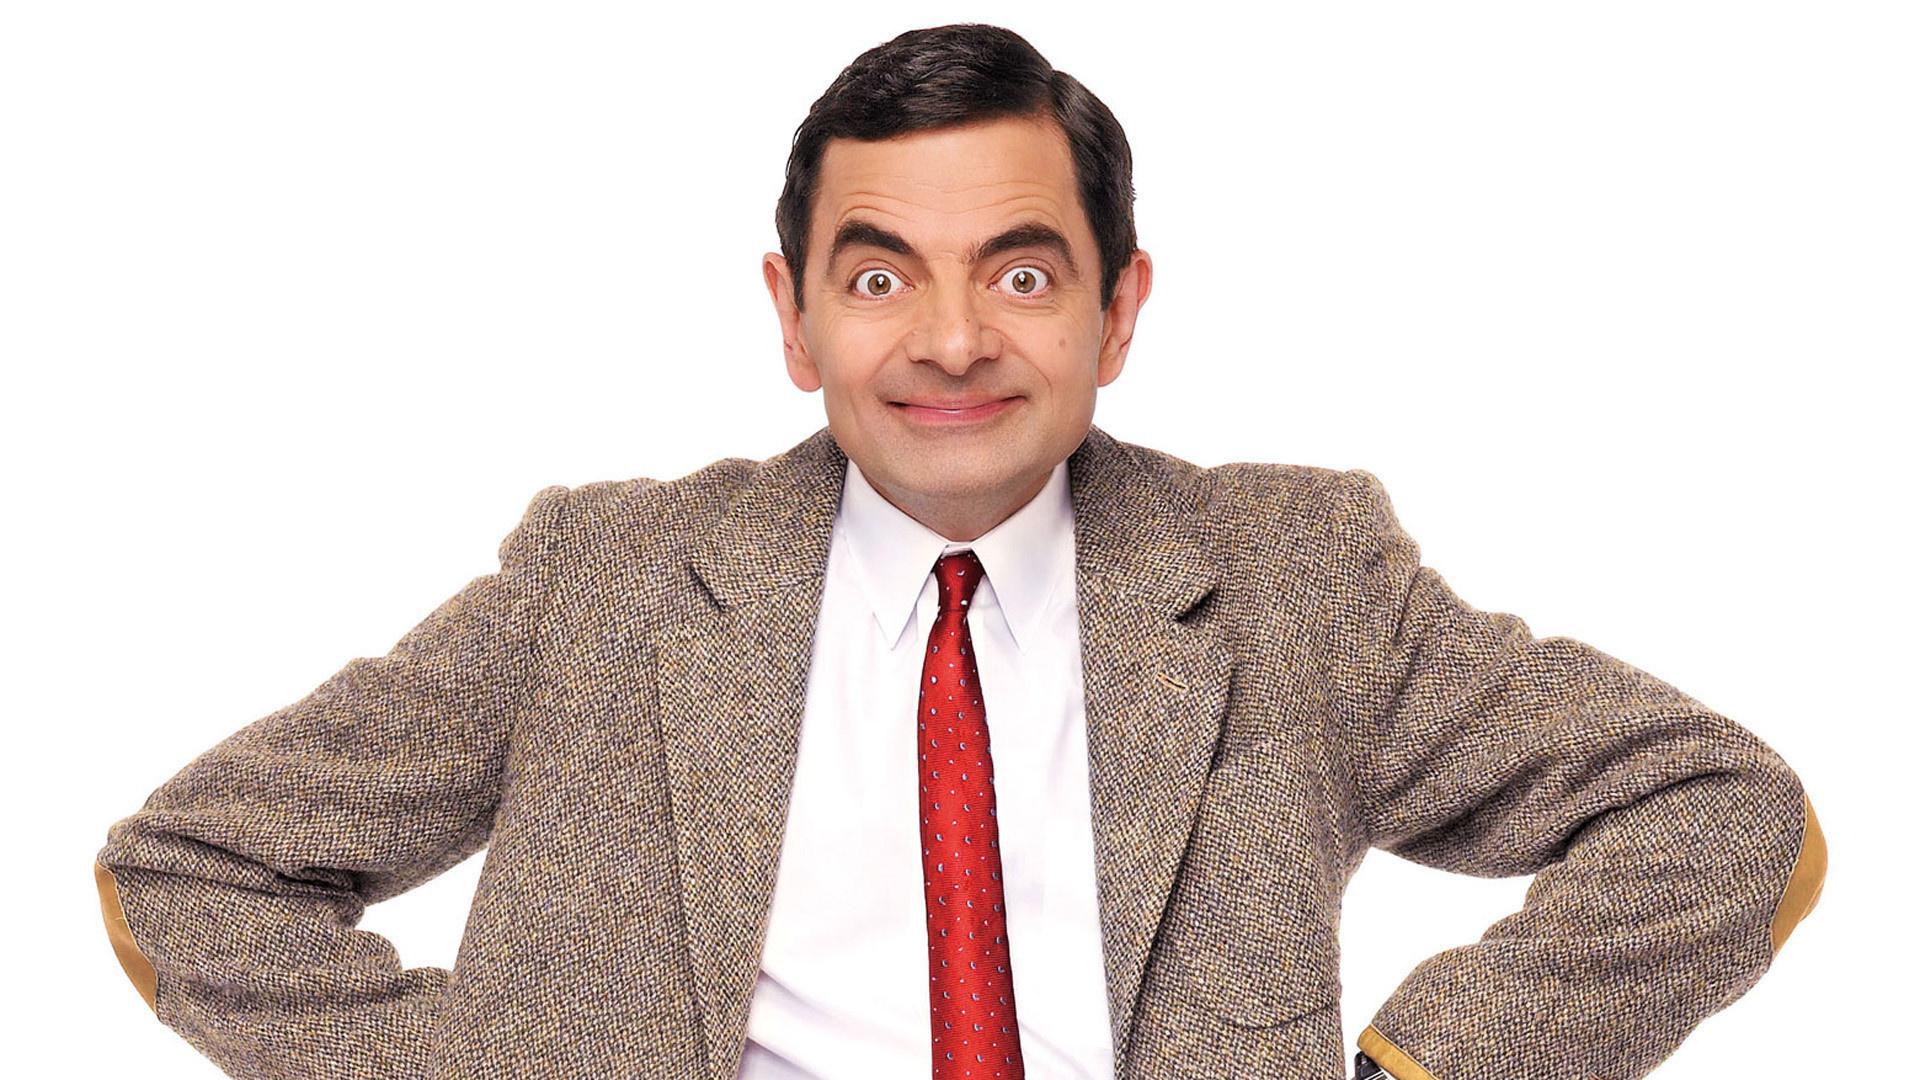 Rowan Atkinson in Mr. Bean (1990)